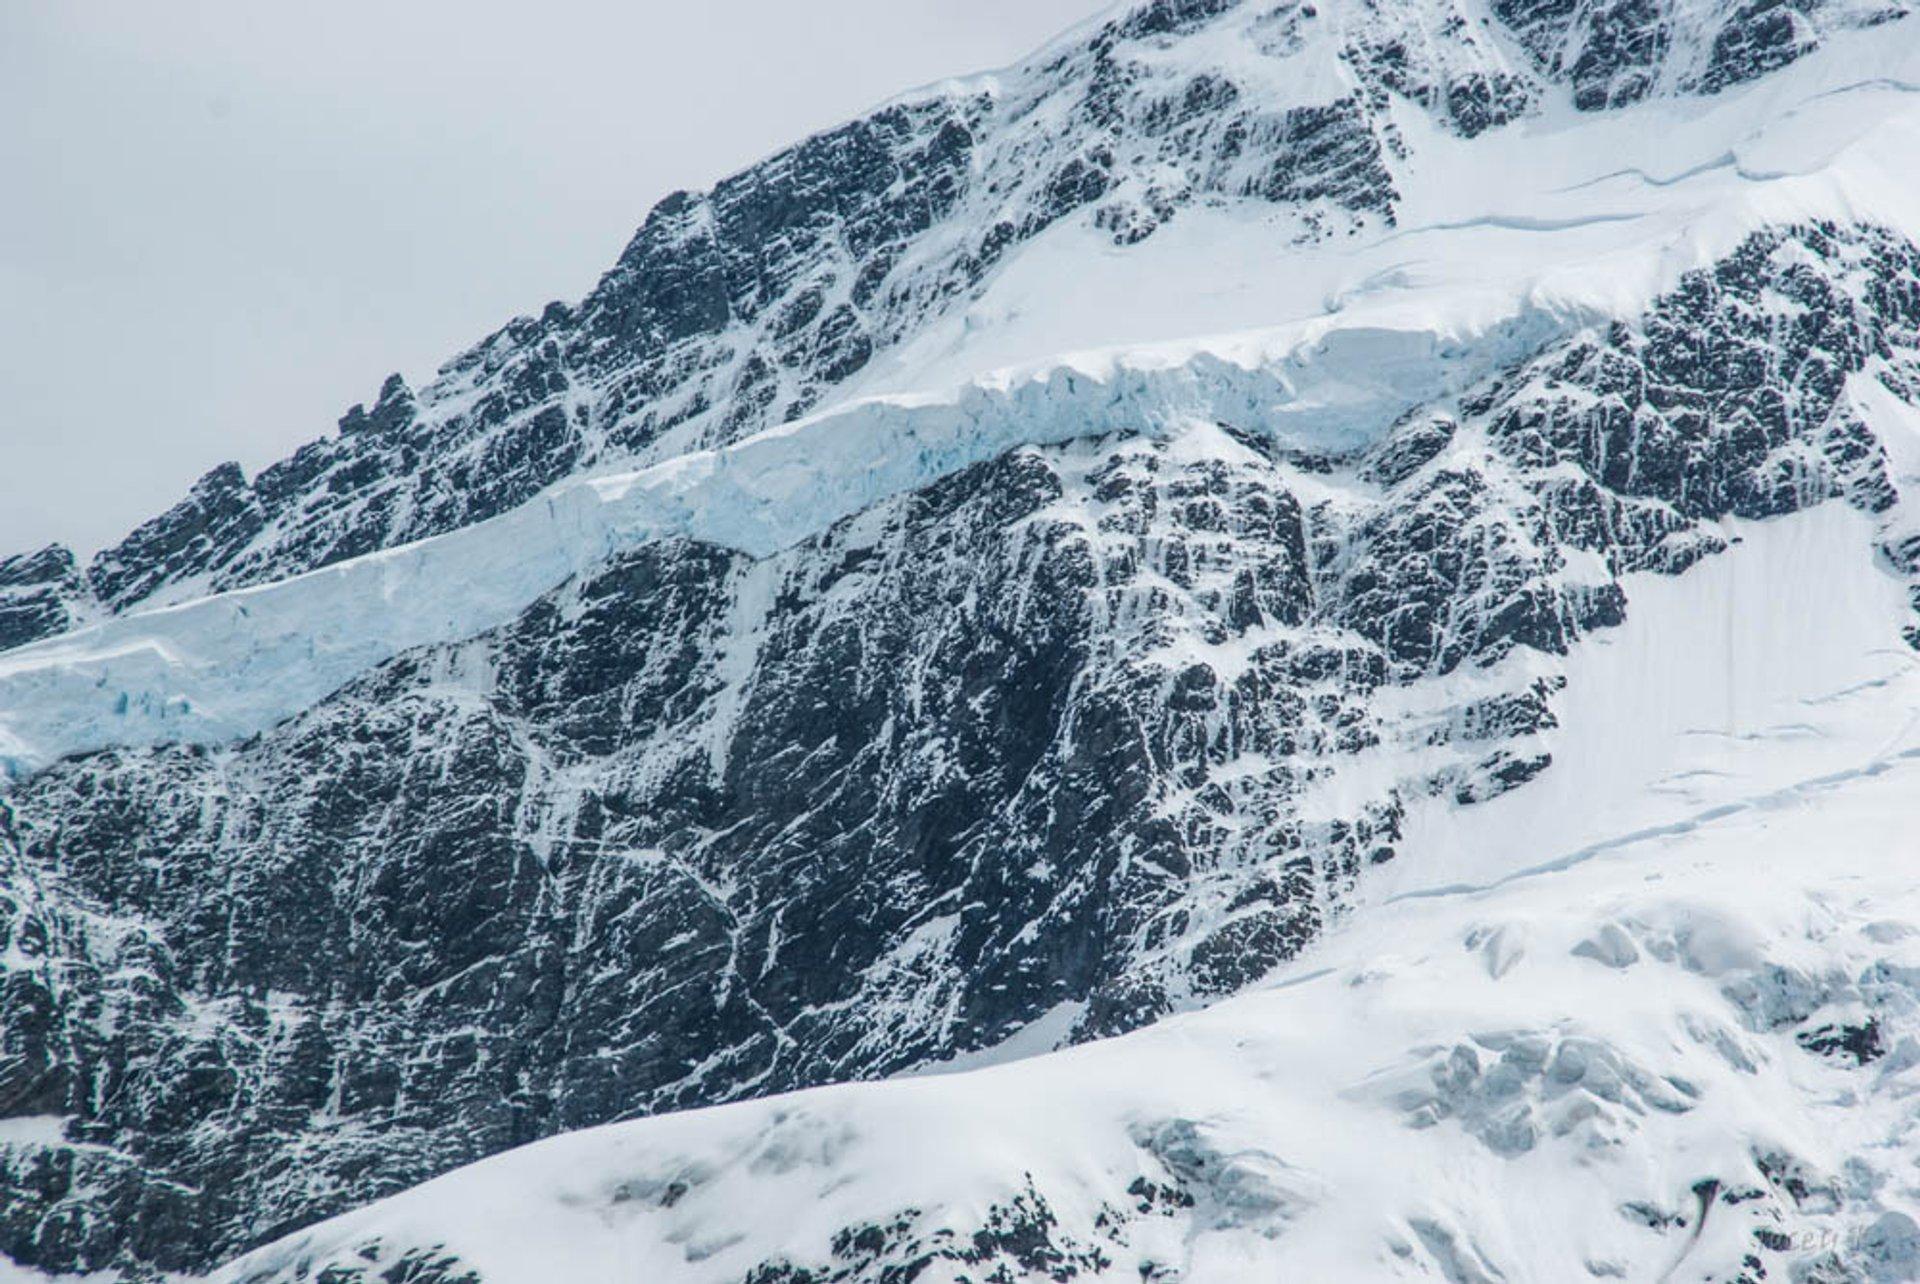 Climbing Mount Cook in New Zealand - Best Season 2020